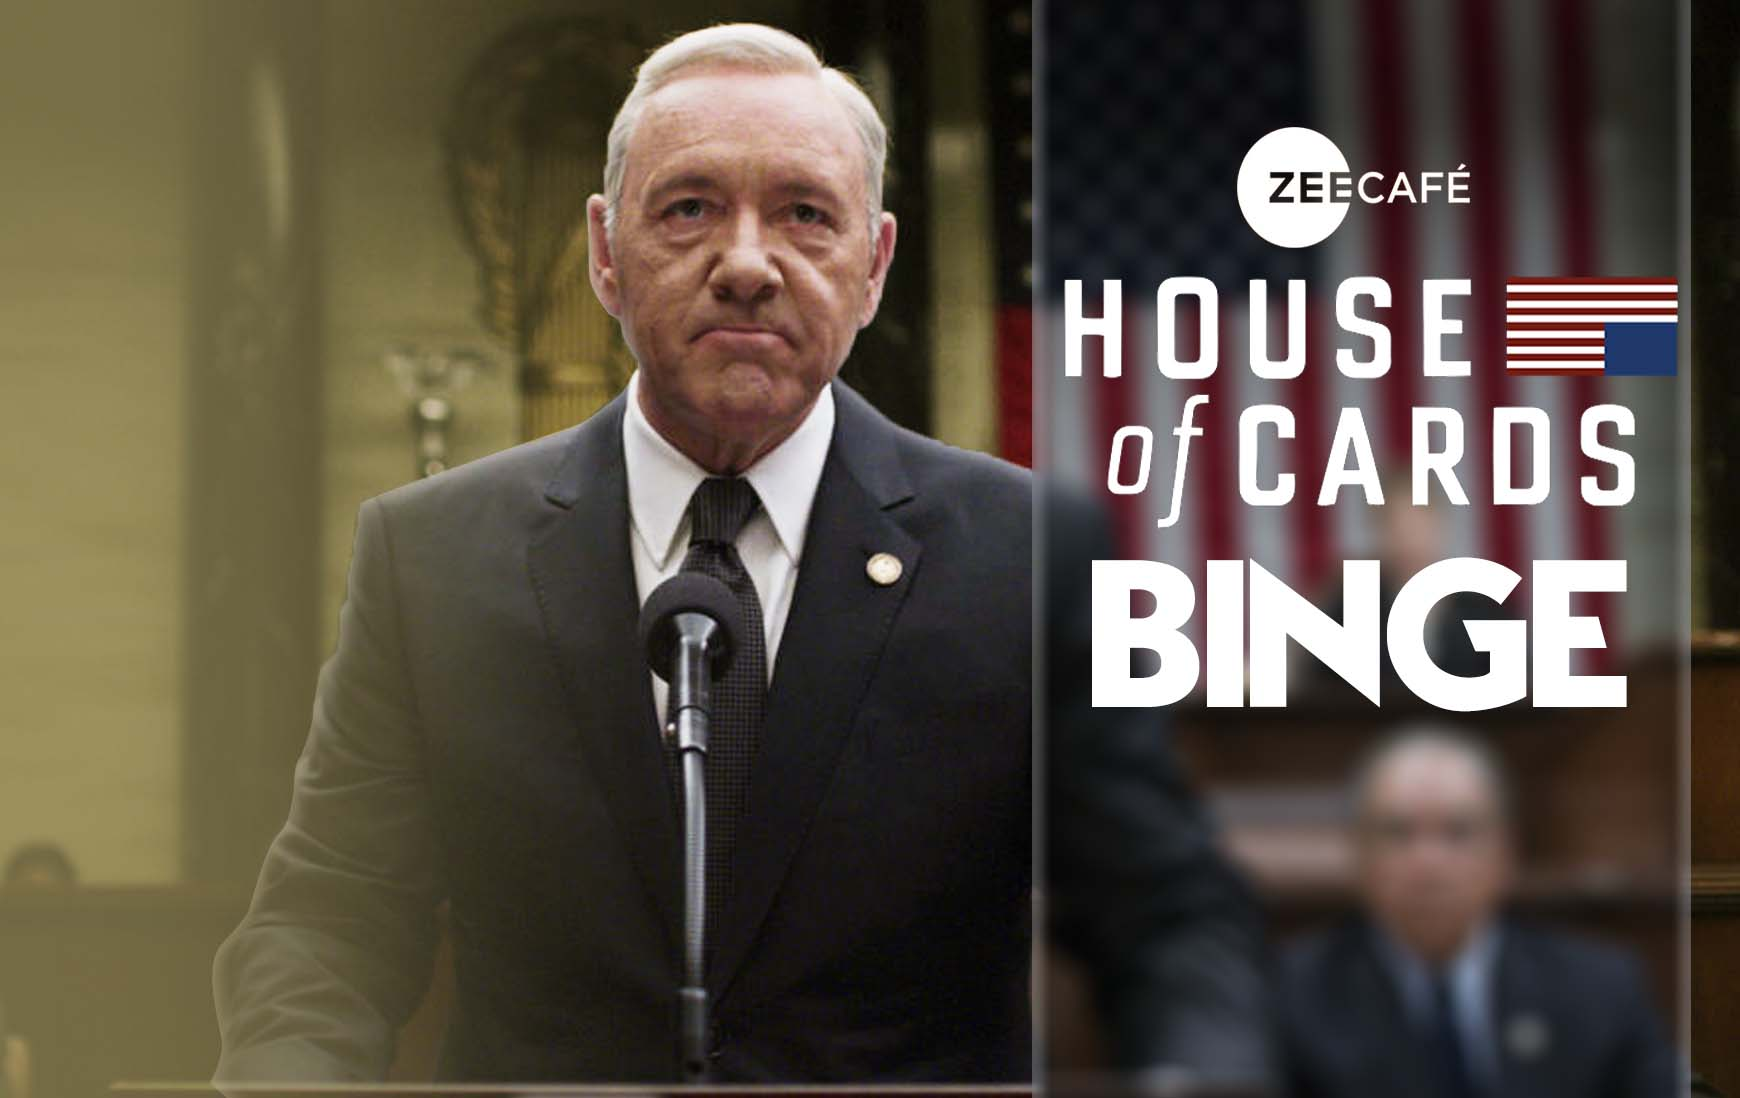 House of Cards – Binge